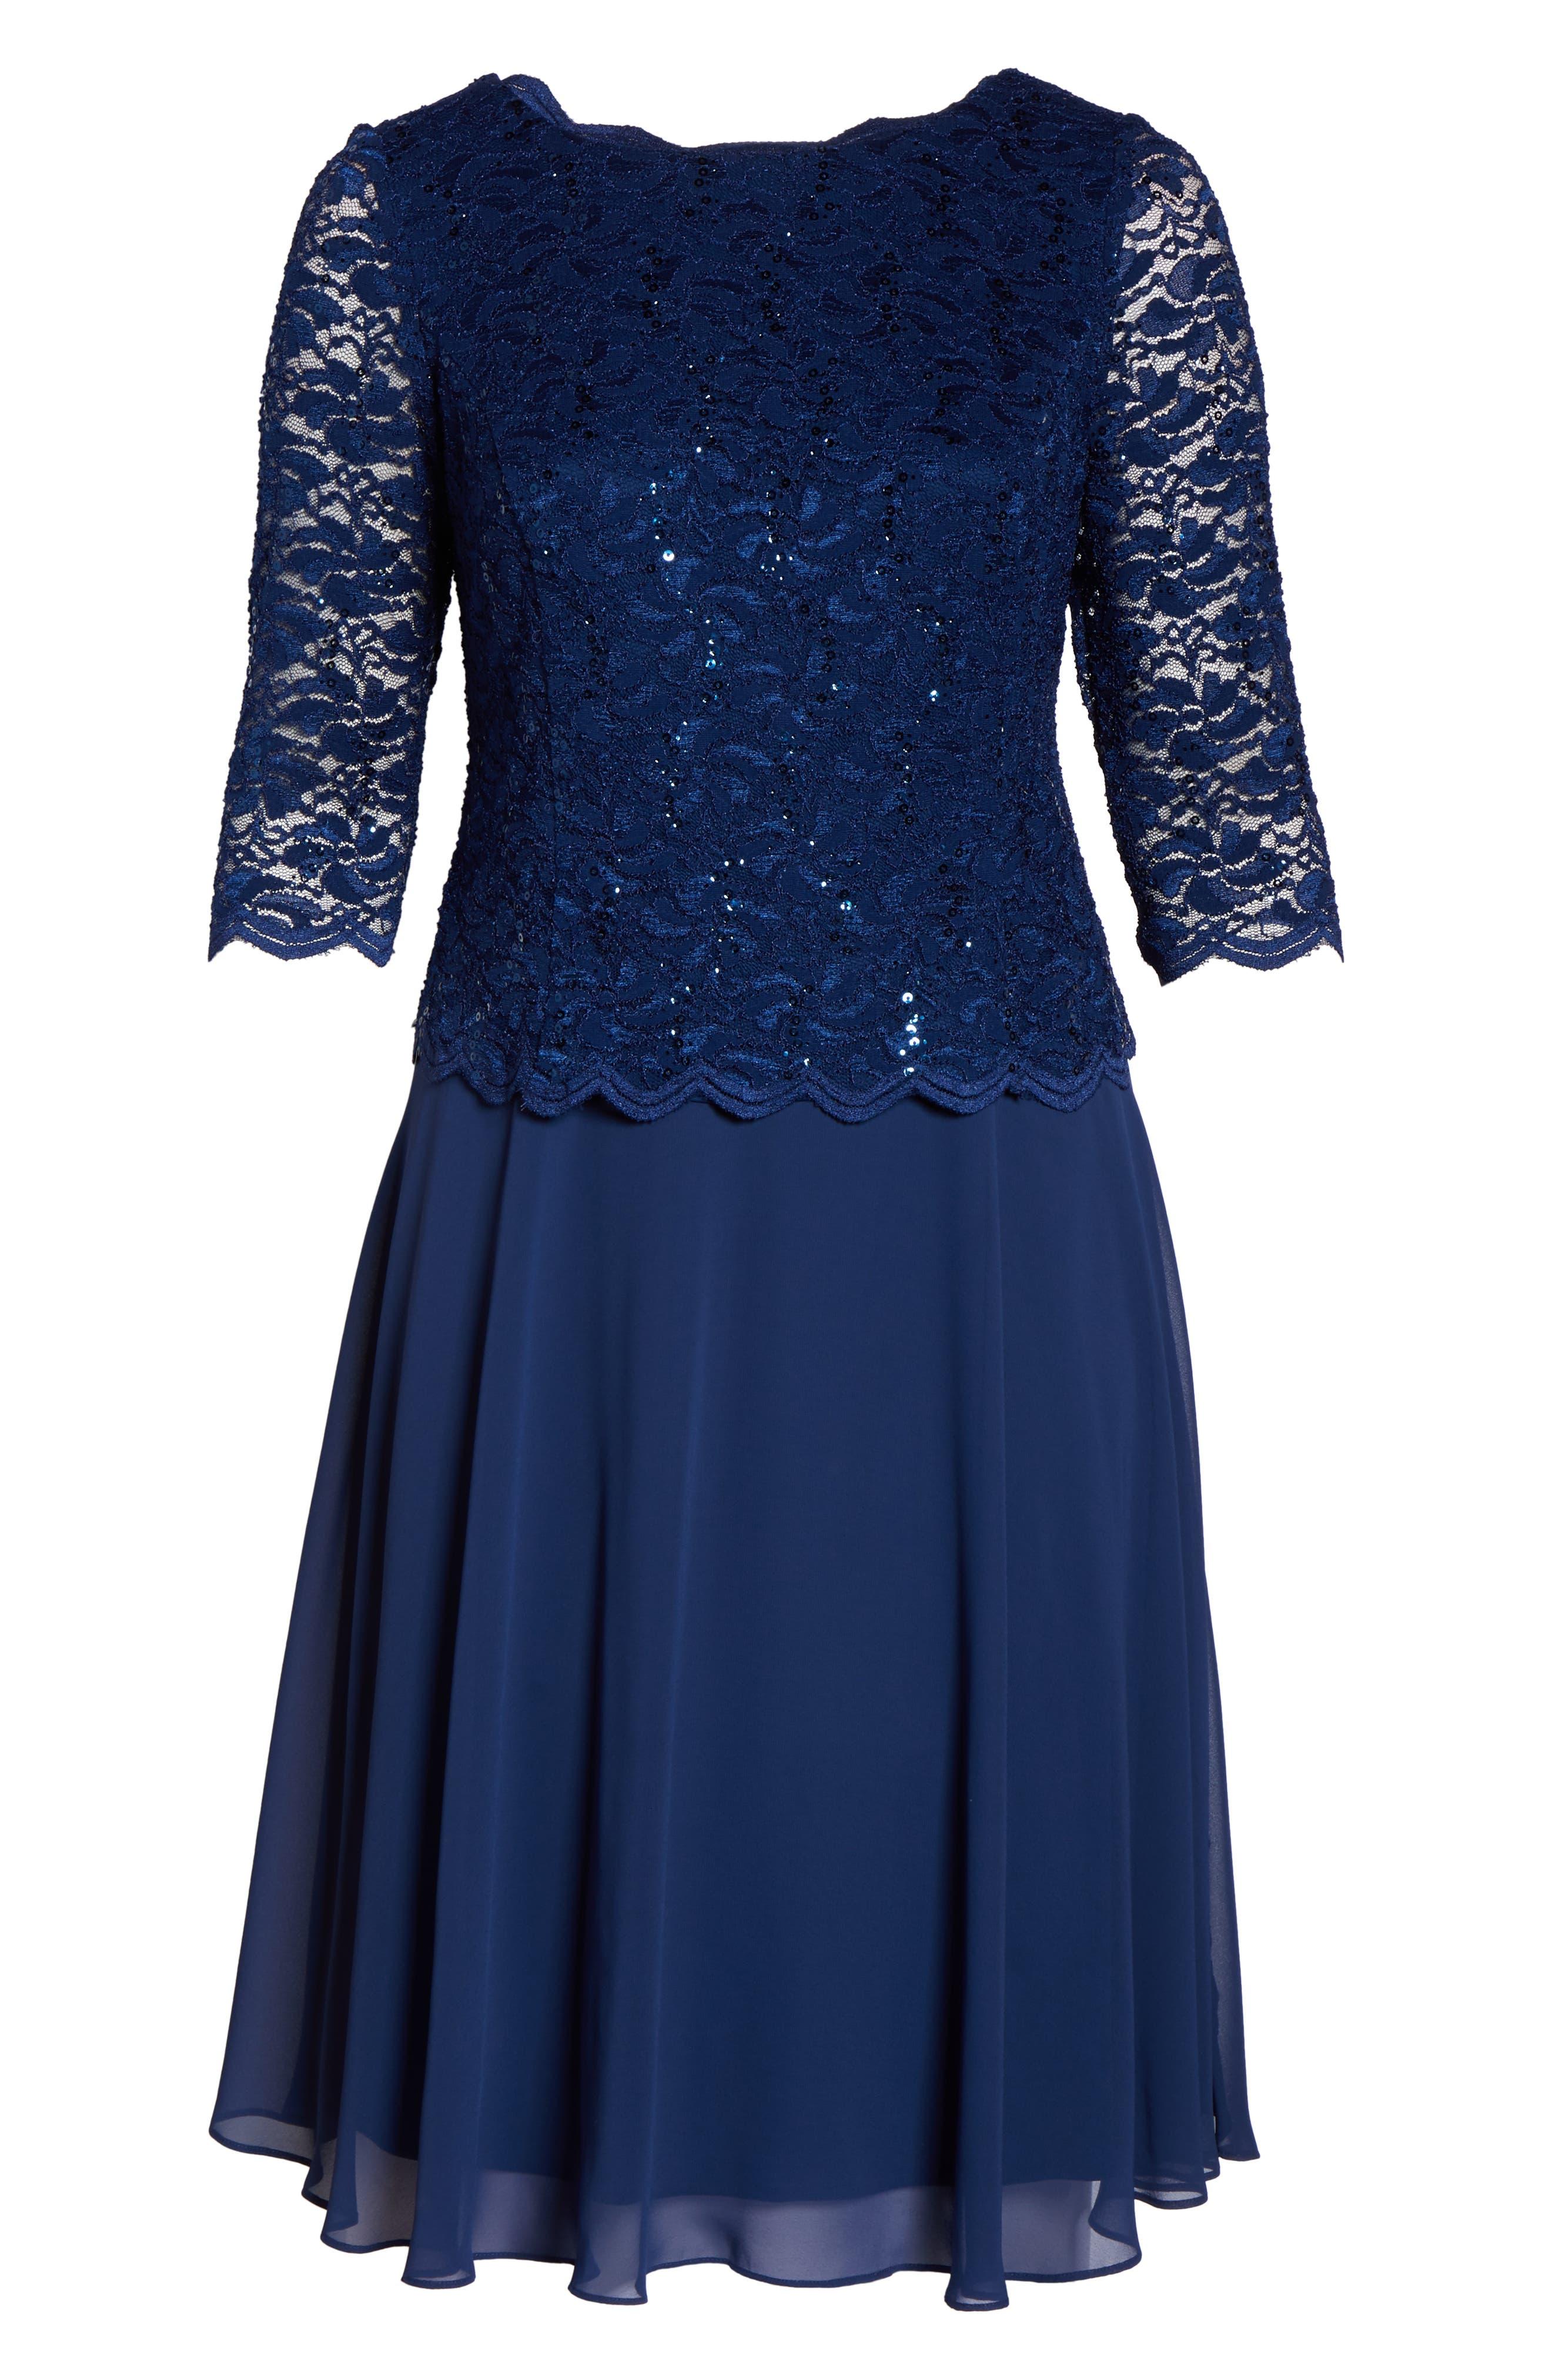 Mock Two-Piece Tea Length Dress,                             Alternate thumbnail 7, color,                             COBALT